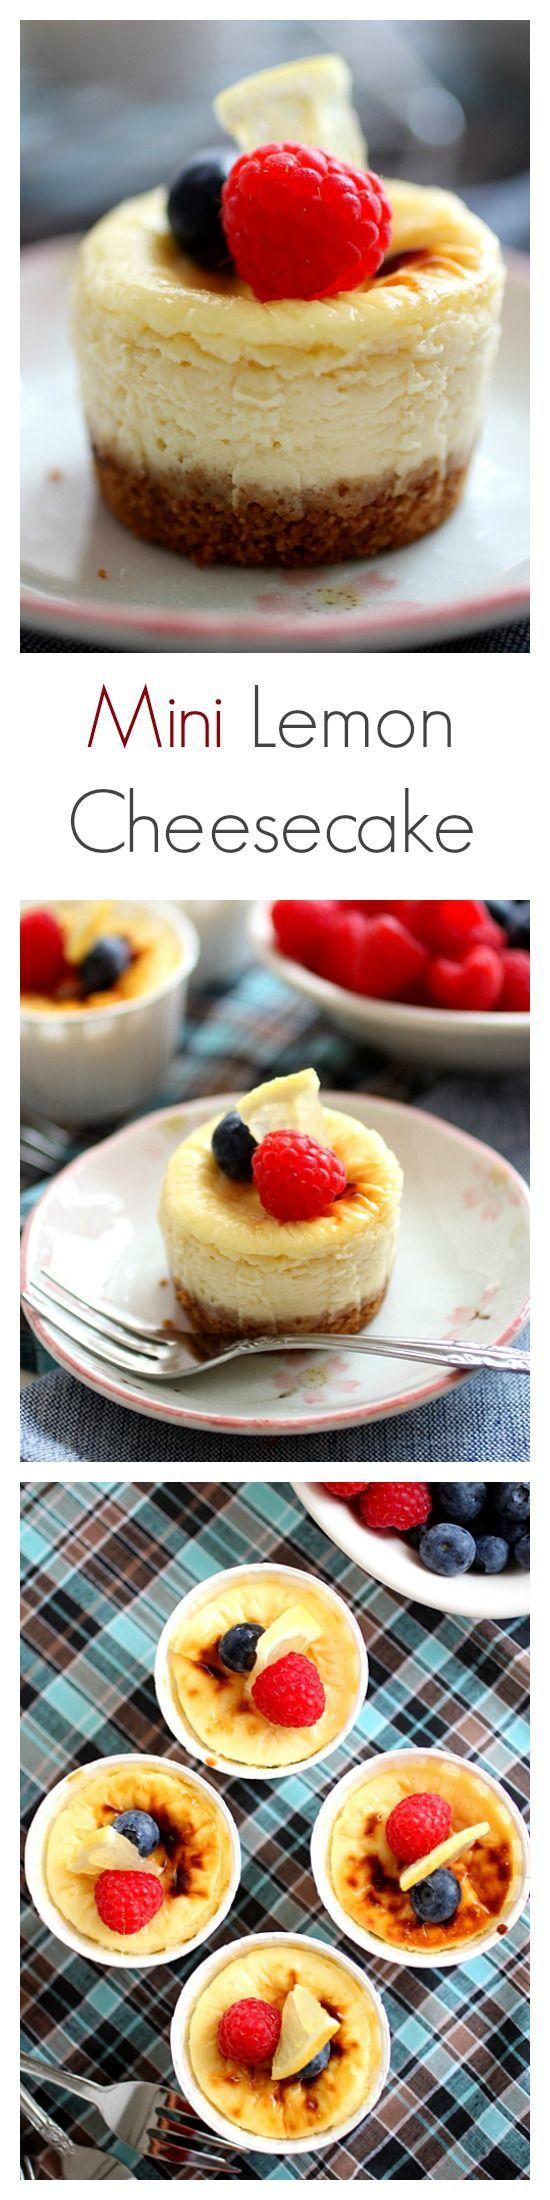 ... Cheesecake Recipies, Citrusi Cheesecake, Minis Size, Lemon Cheesecake